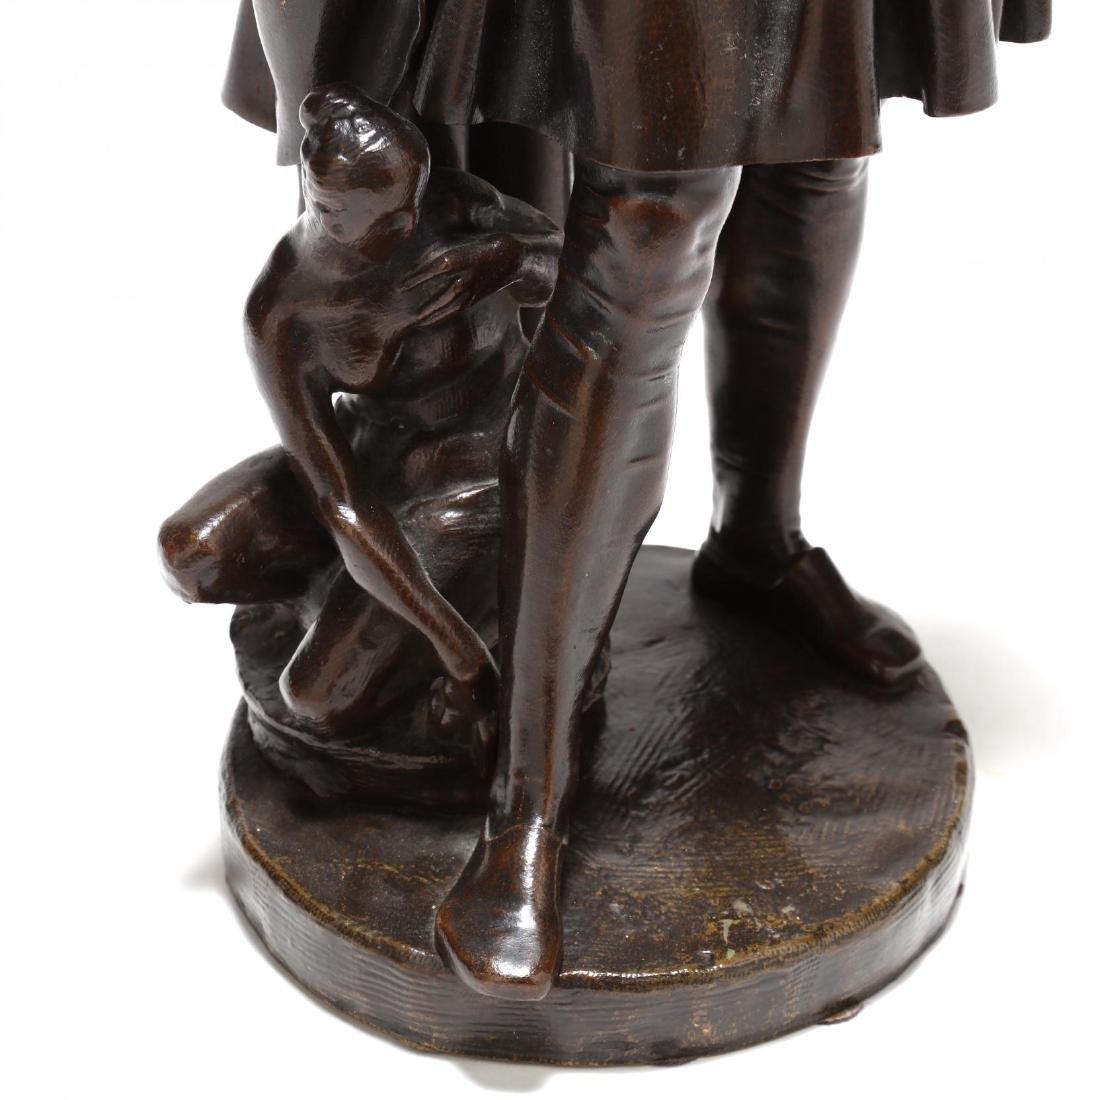 Antique Bronze Sculpture of a Renaissance Man - 2